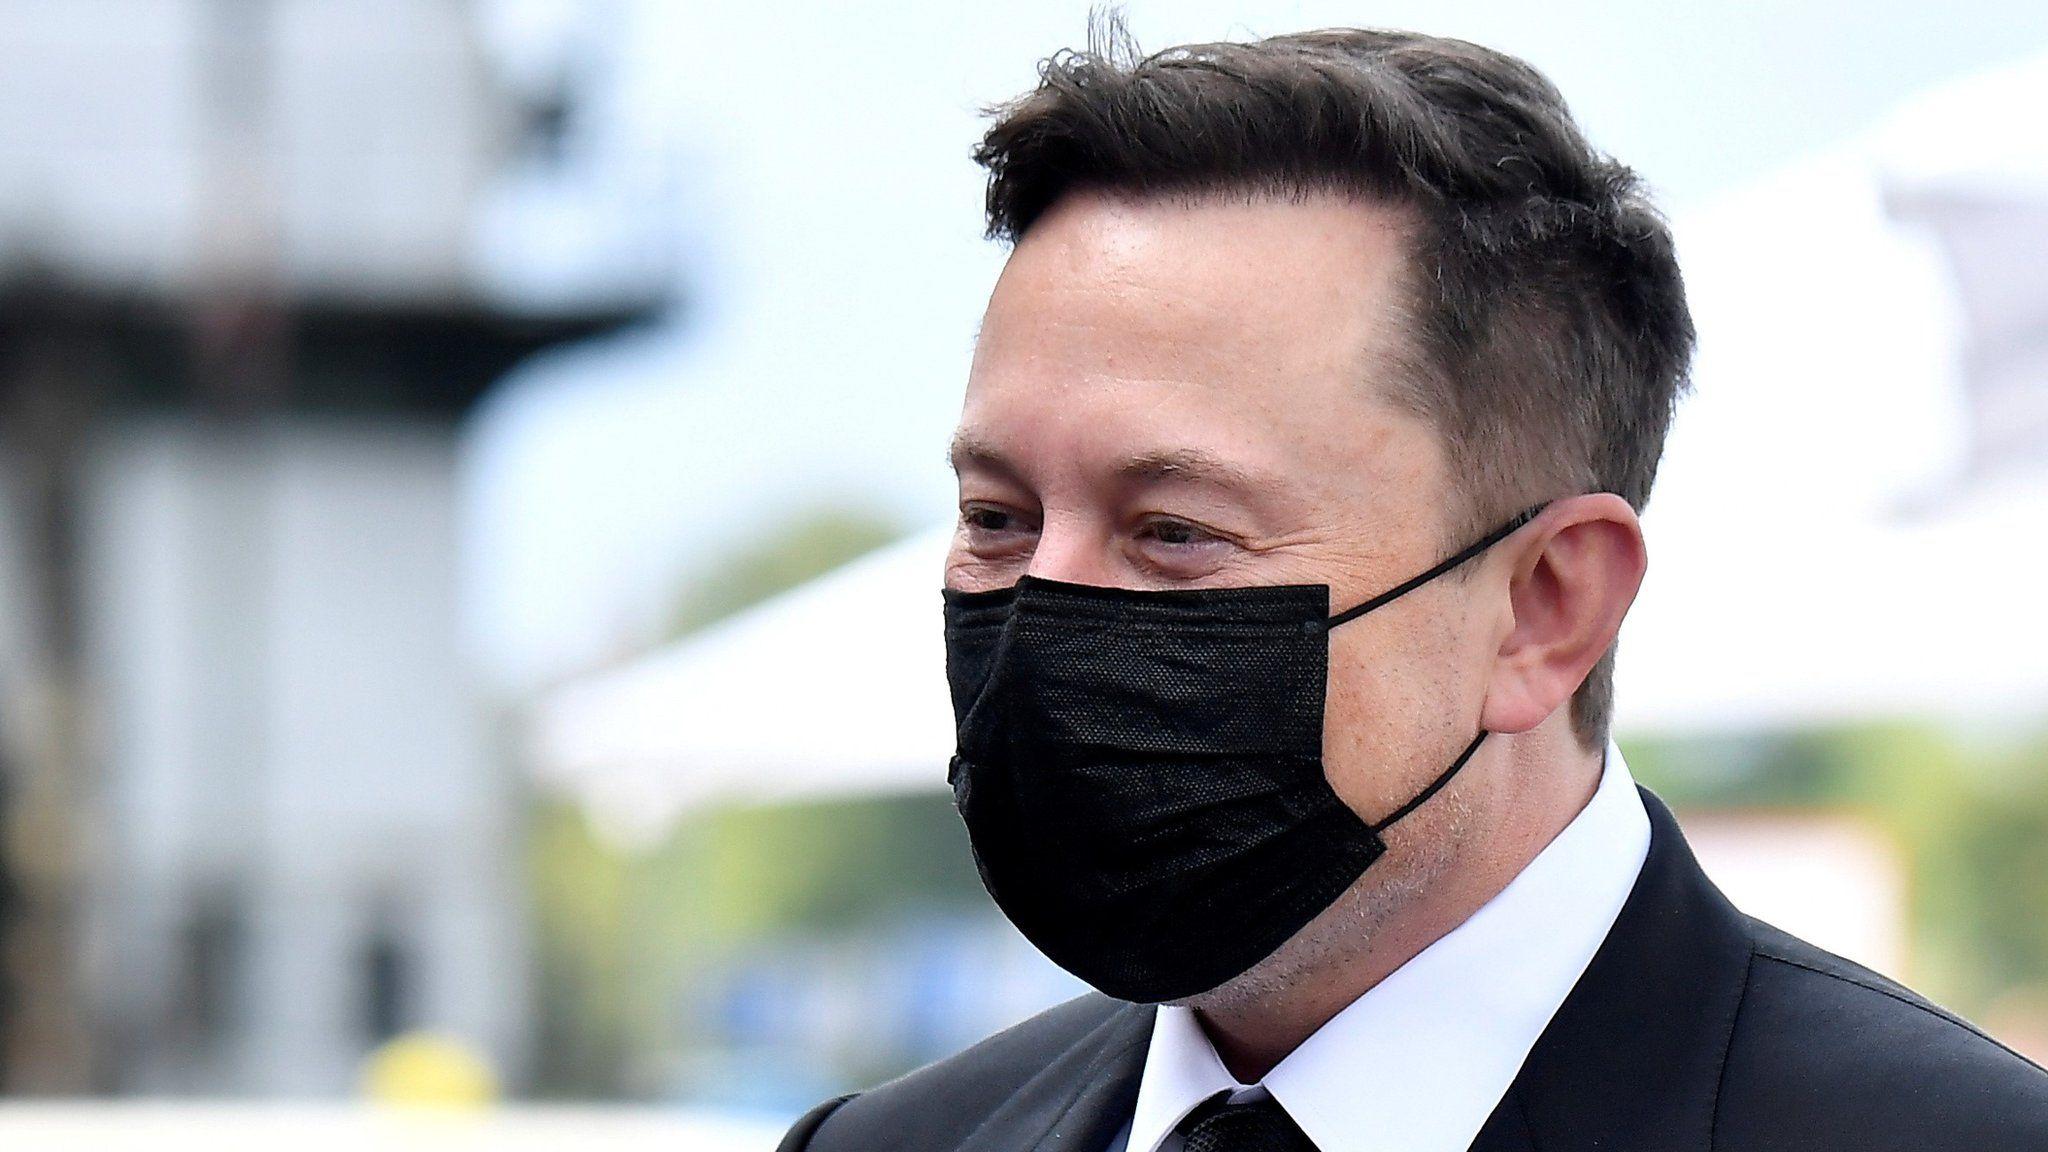 Coronavirus Elon Musk Likely Has Moderate Case Bbc News